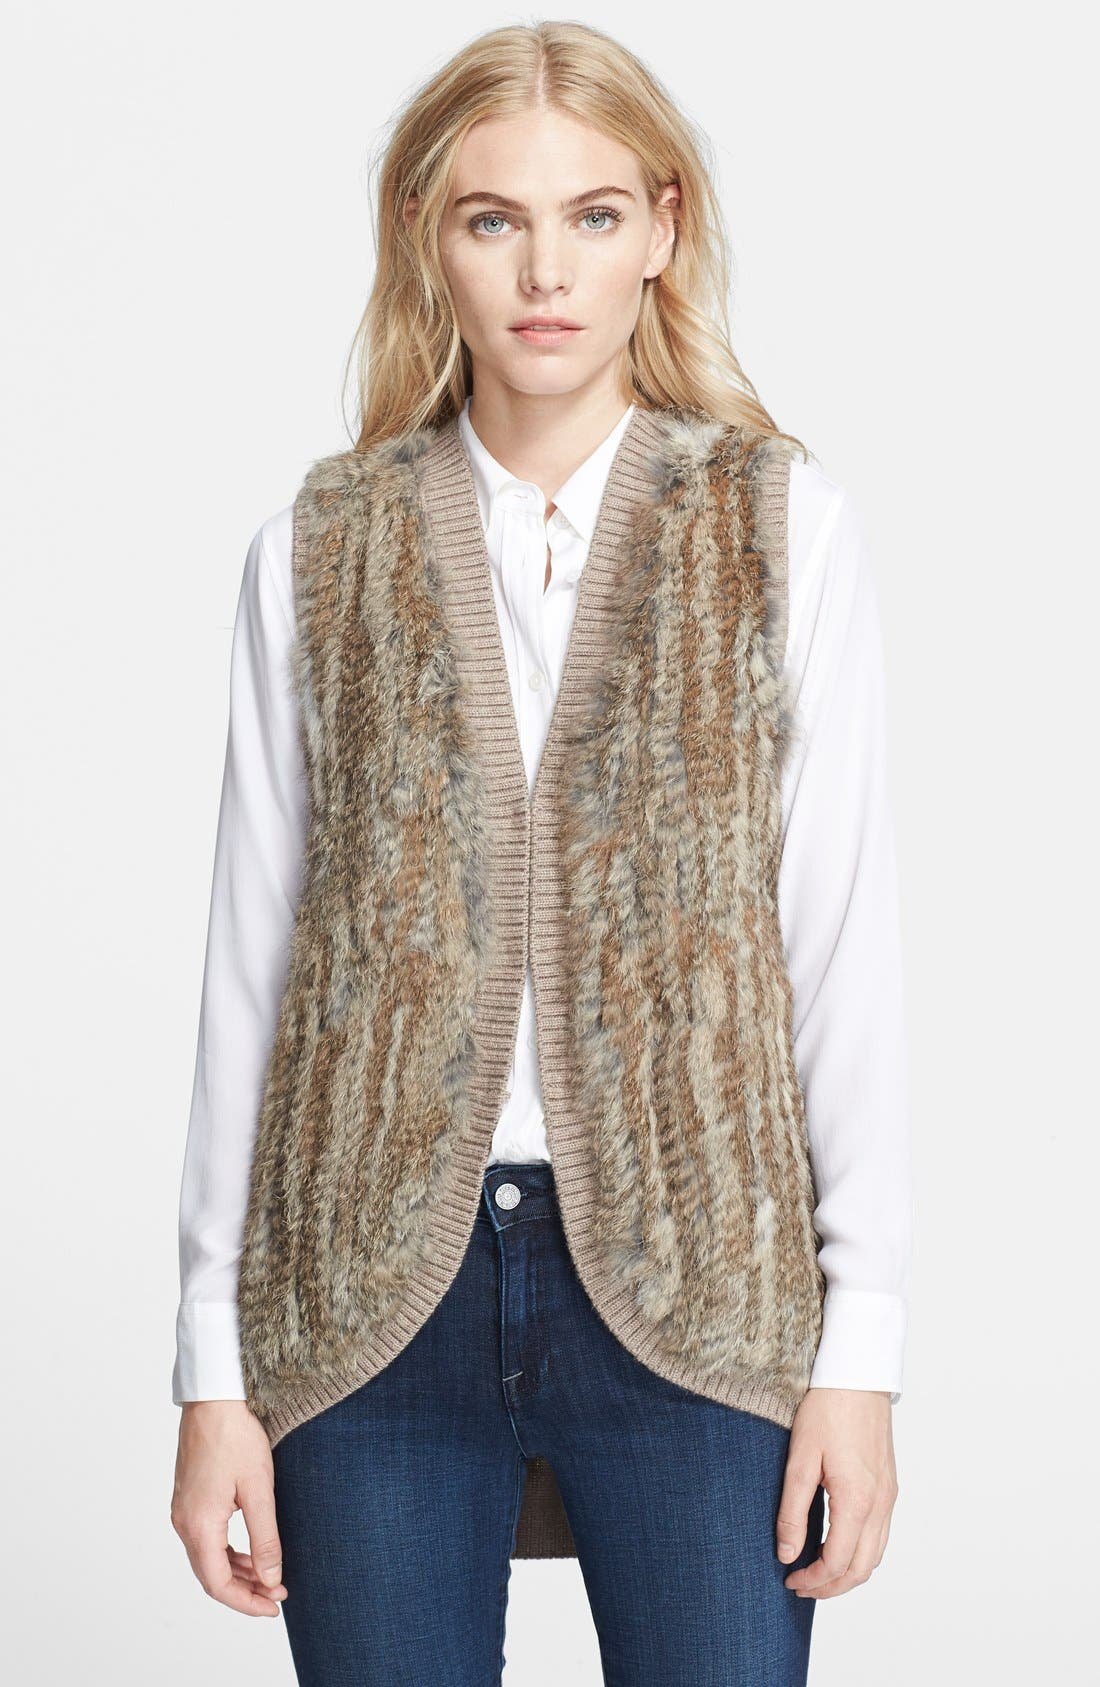 Main Image - Joie 'Ellera' Genuine Rabbit Fur Sleeveless Jacket